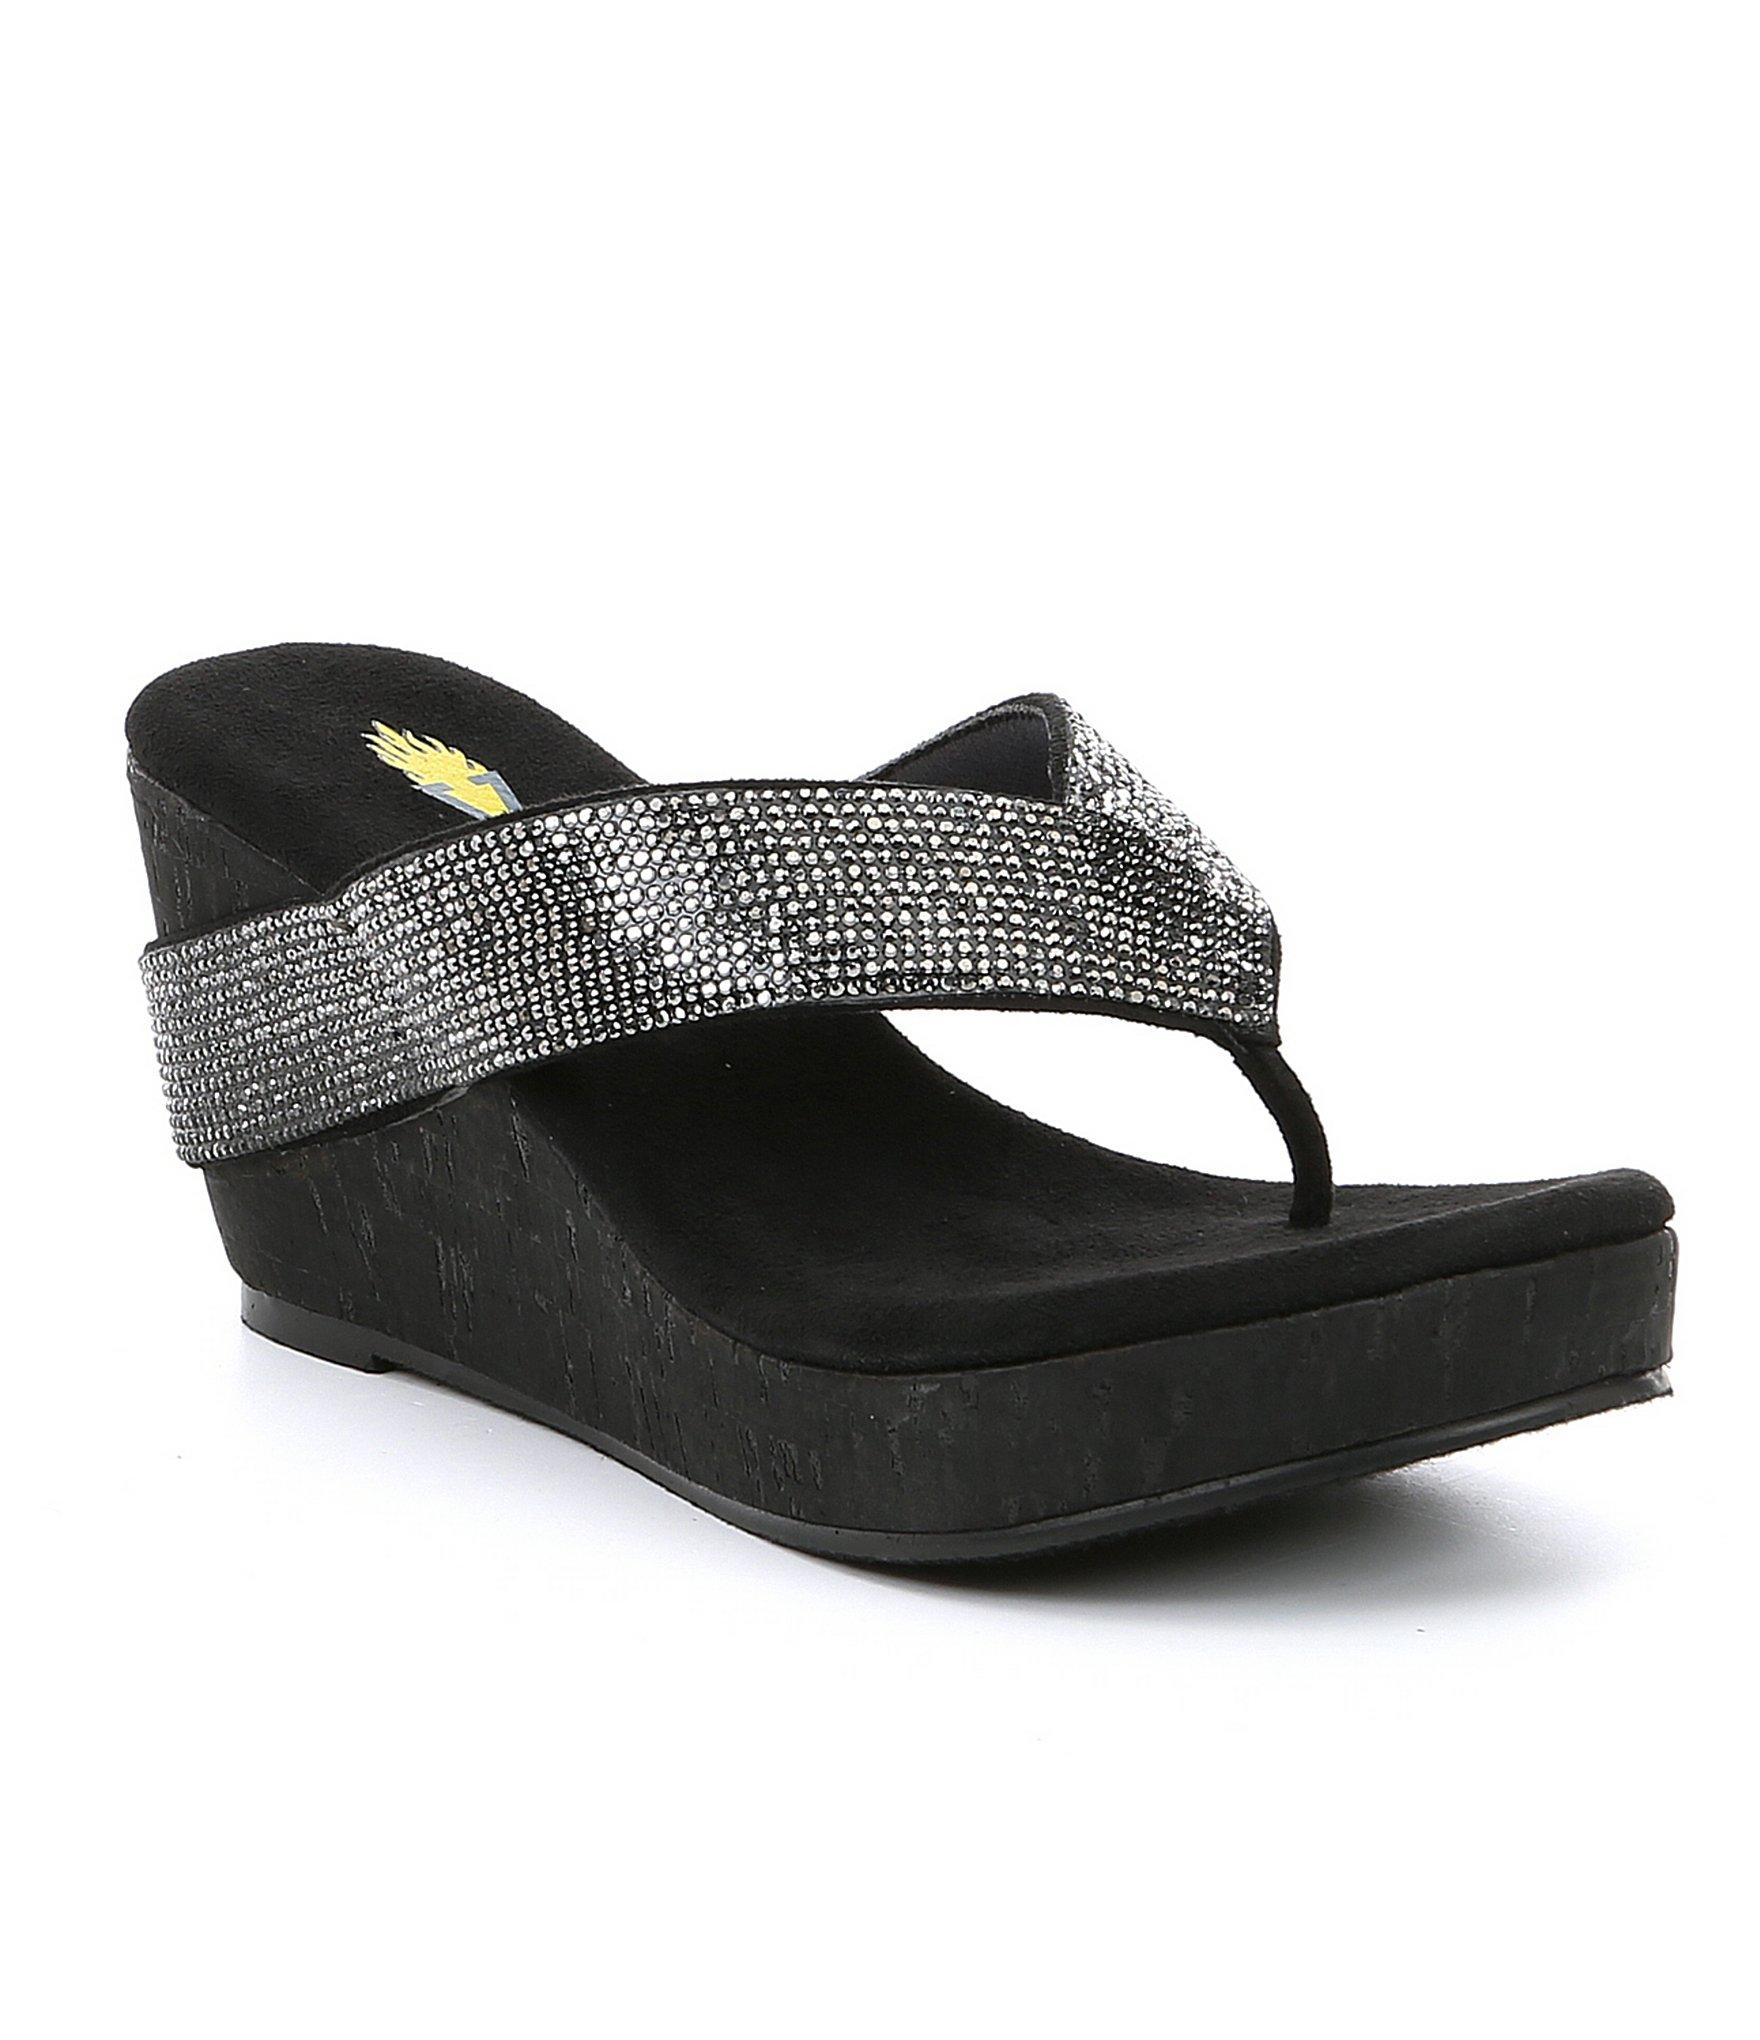 d1858be129 Lyst - Volatile Cristina Rhinestone Cork-wedge Sandals in Black